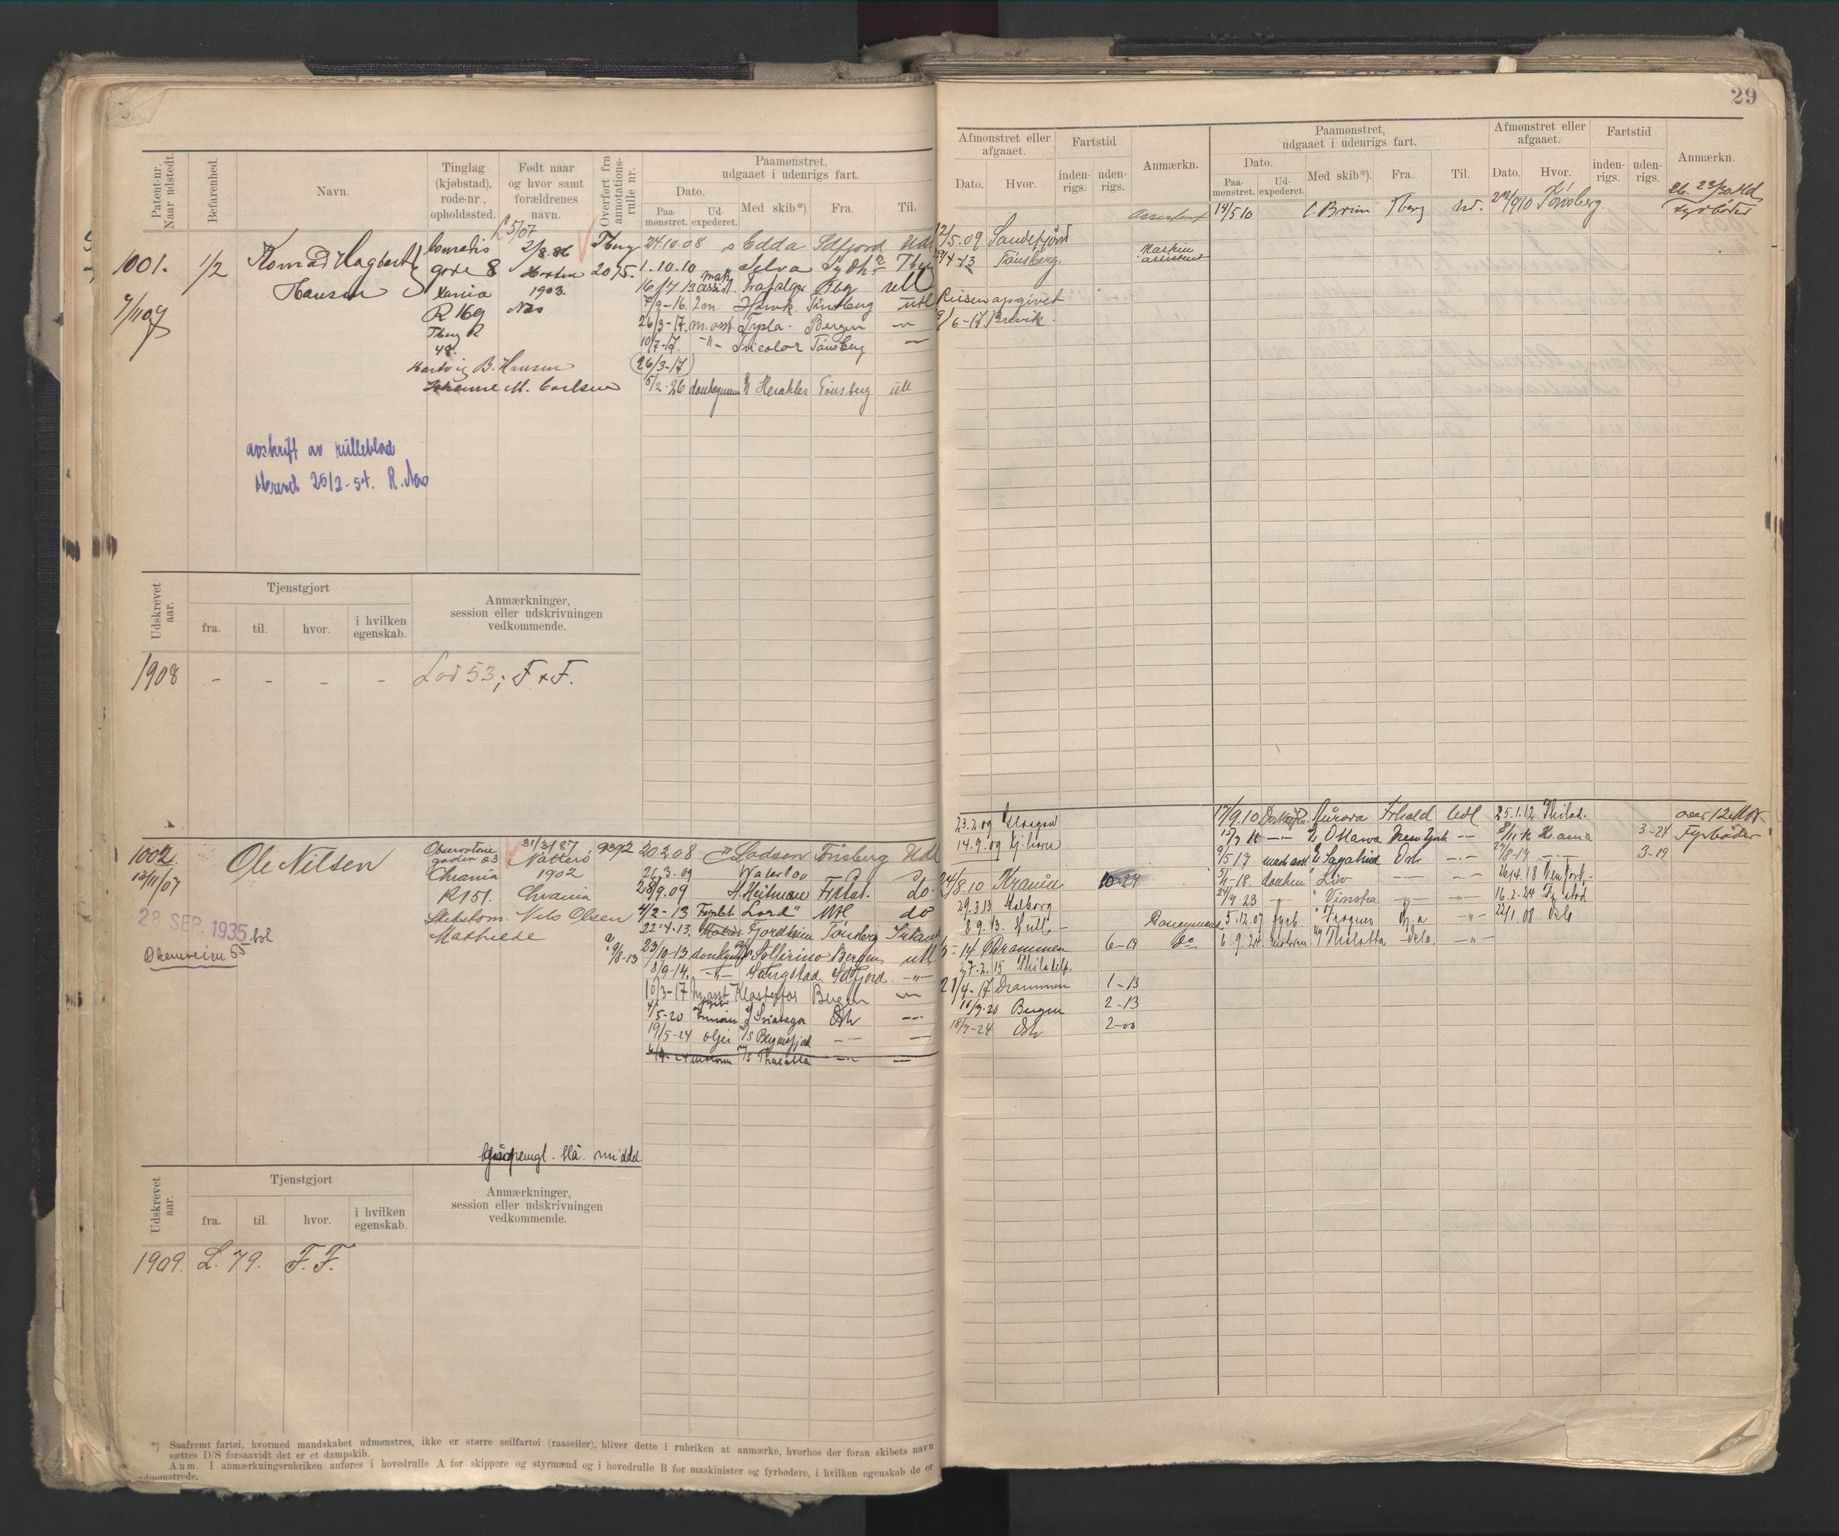 SAO, Oslo sjømannskontor, F/Fd/L0002: B-rulle, 1906-1916, s. 28b-29a